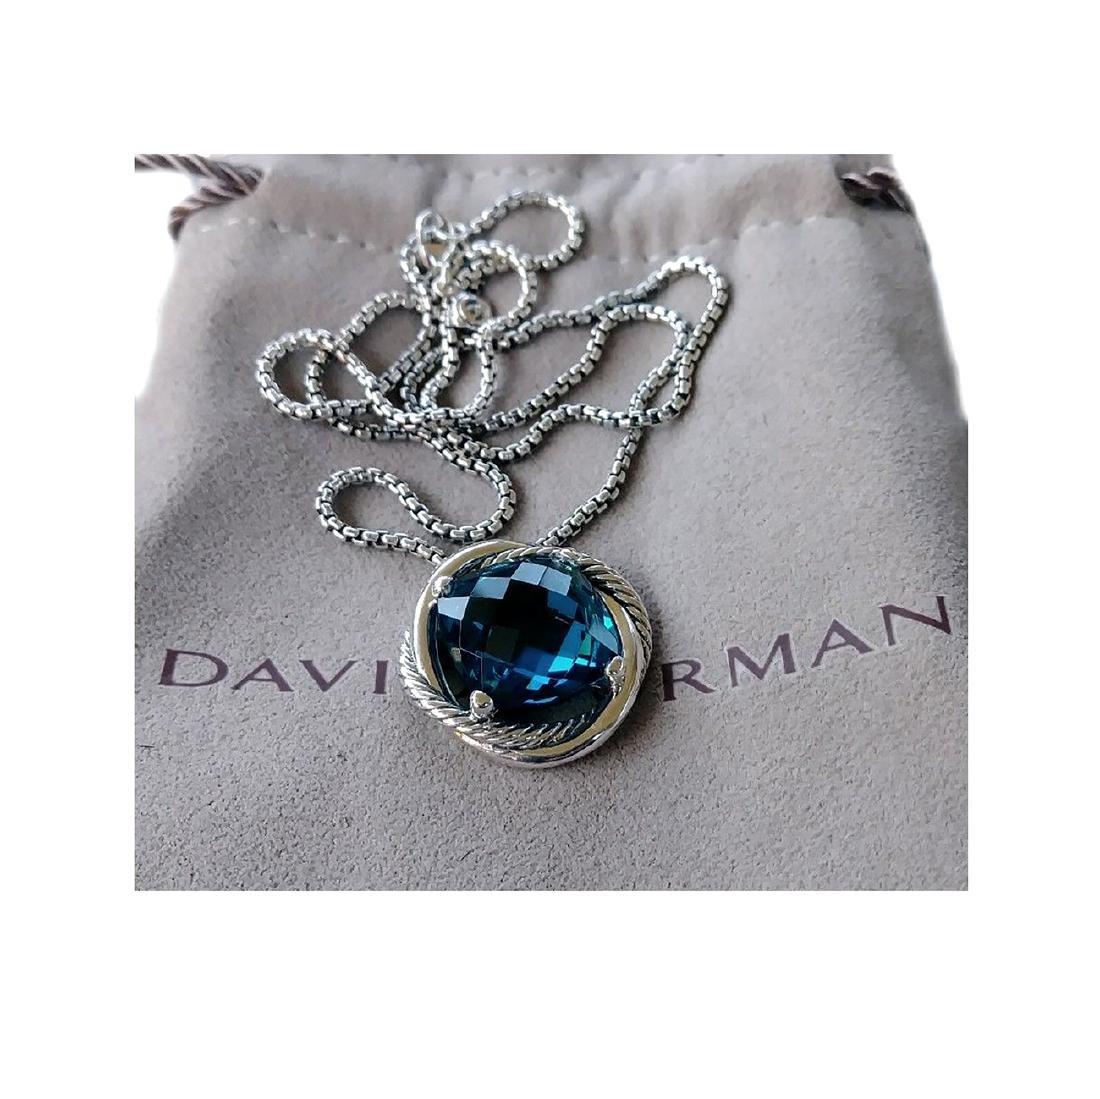 David Yurman Sterling Silver Infinity 14mm. Blue Topaz - 3